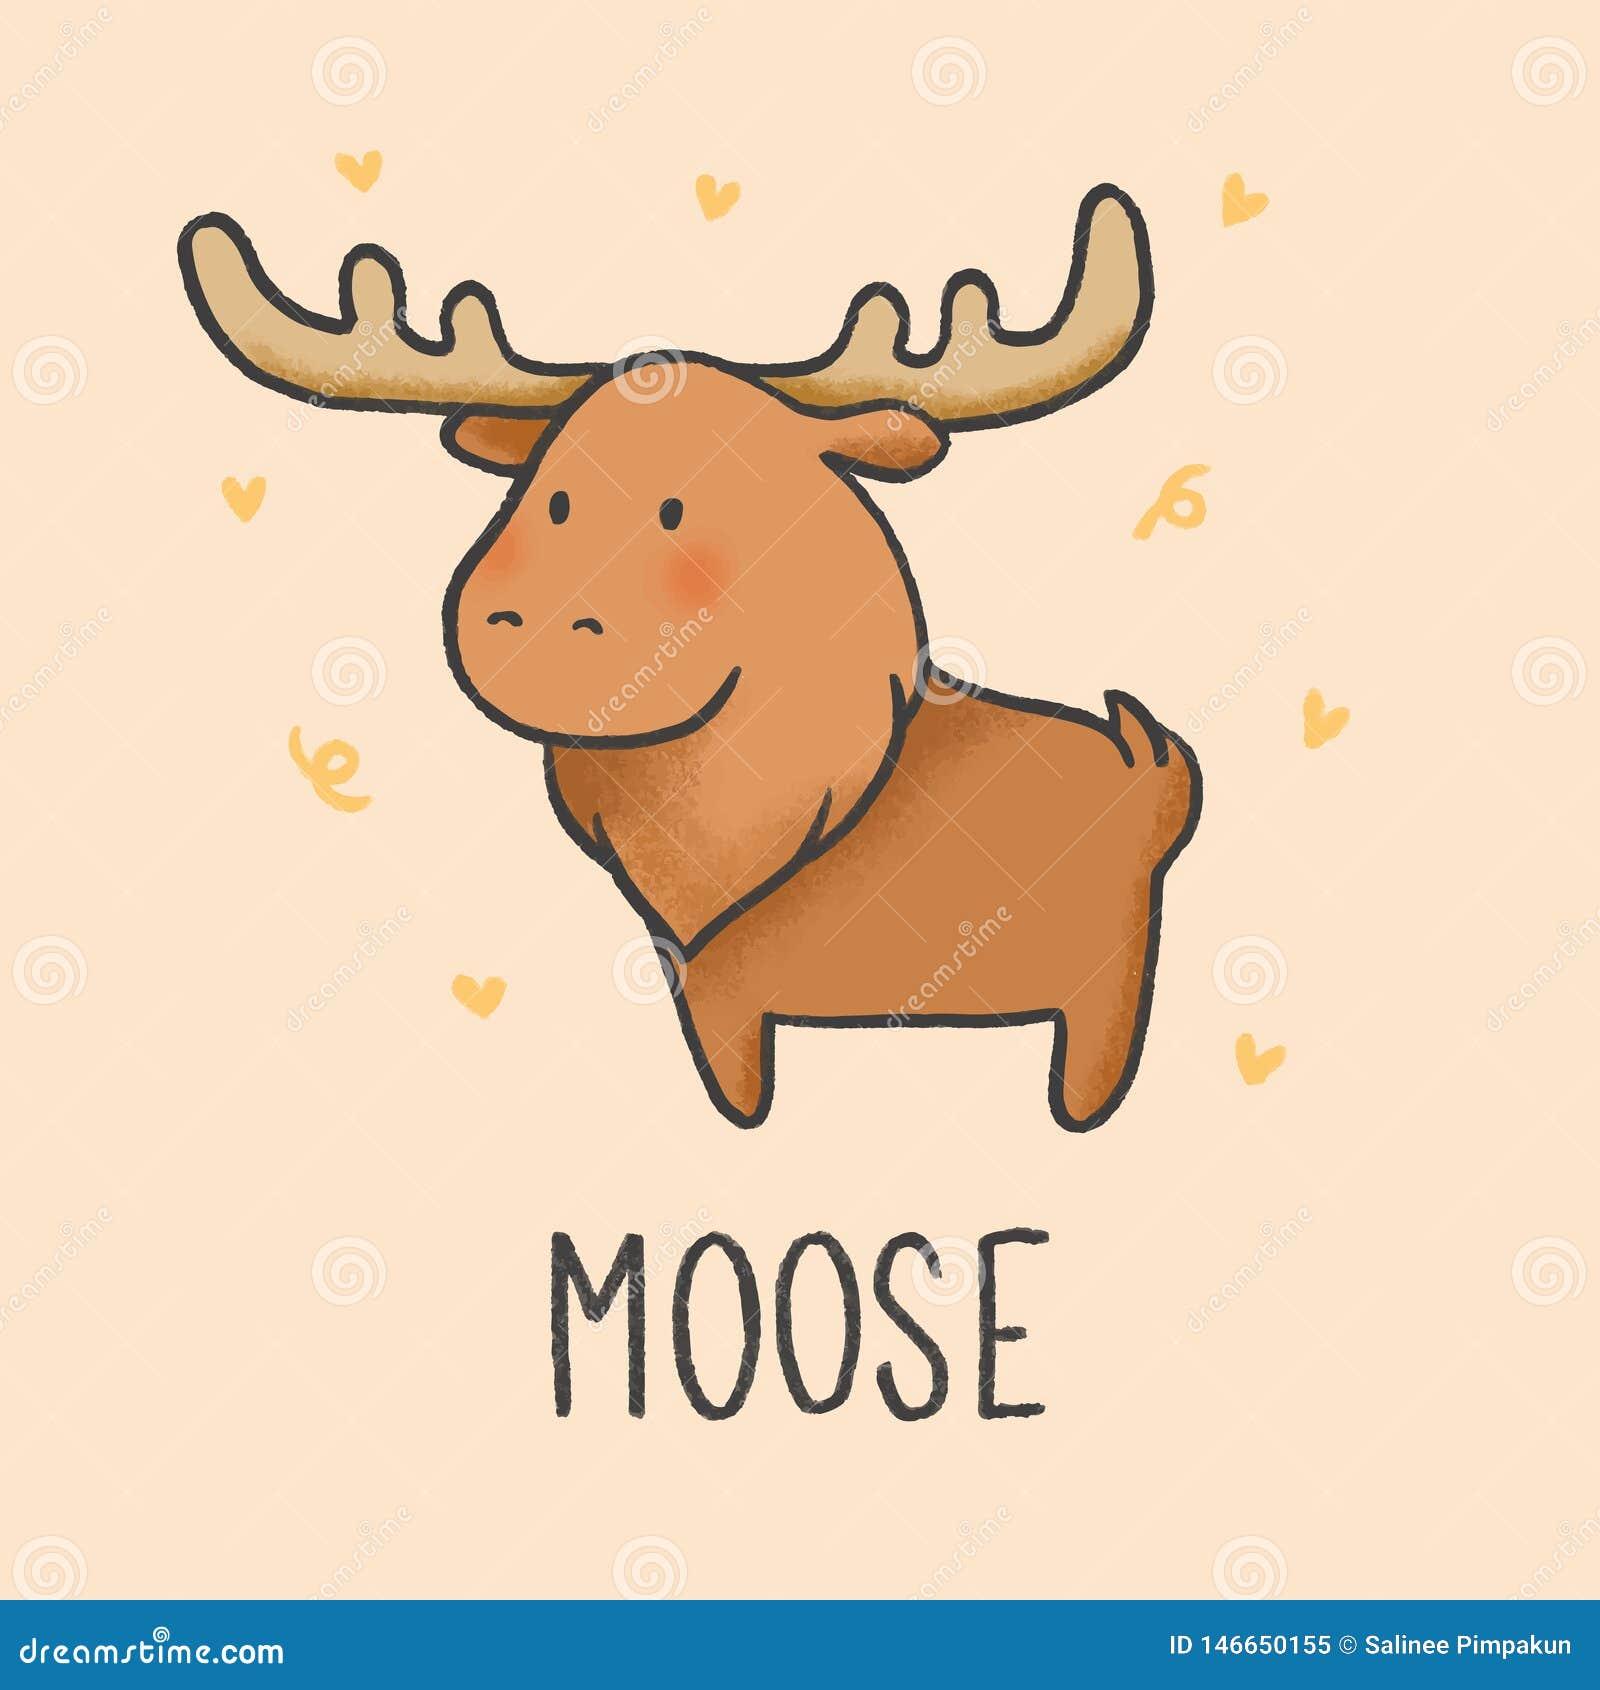 Cute Moose cartoon hand drawn style